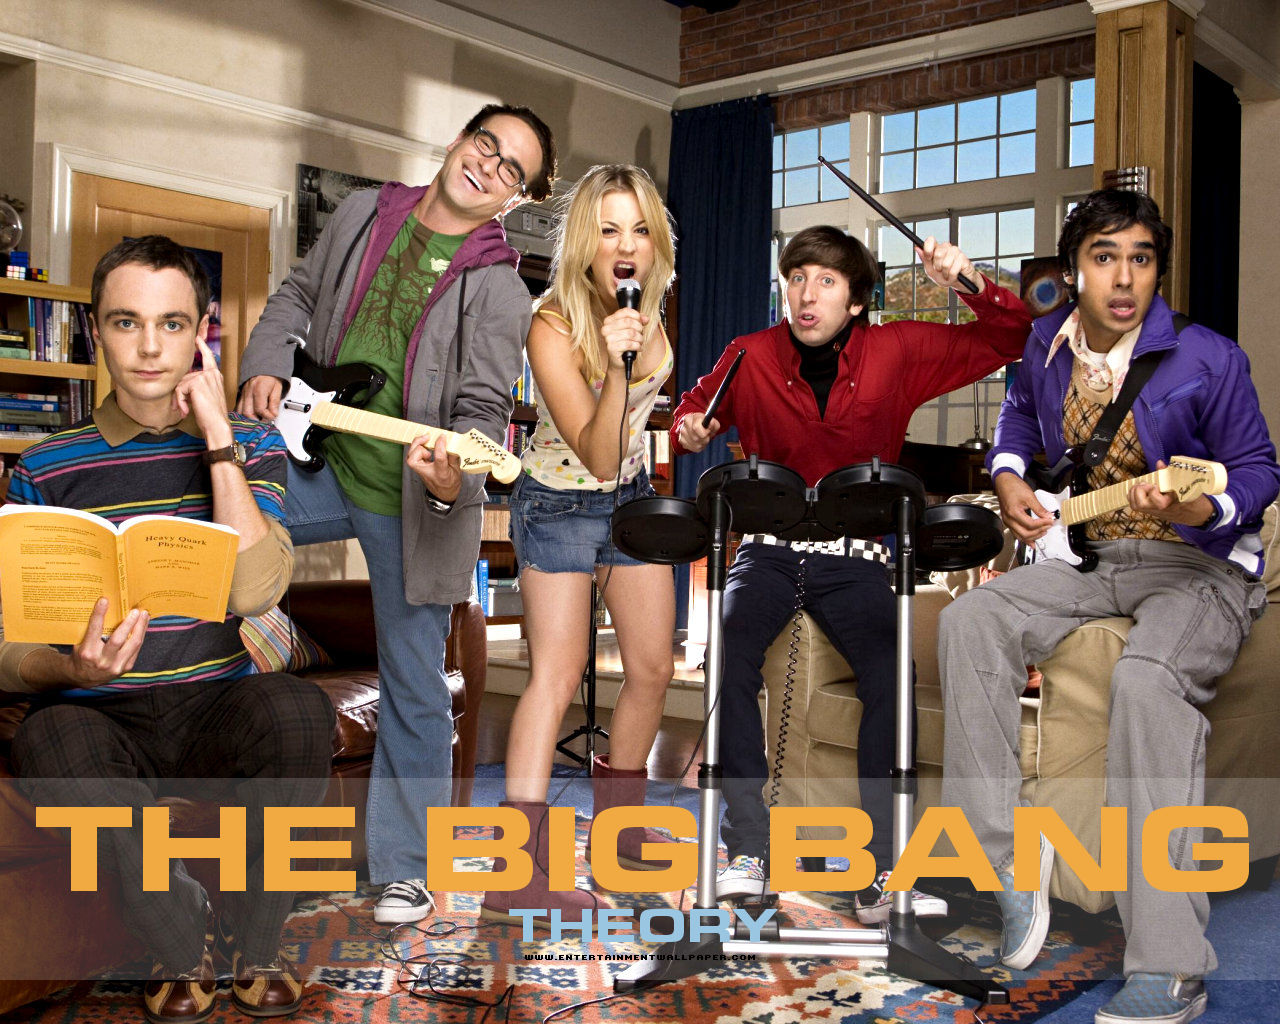 http://2.bp.blogspot.com/-_HmTaNz4C7g/UA22W35PXdI/AAAAAAAAHKU/tuQSTfRAxA8/s1600/tv_the_big_bang_theory01.jpg